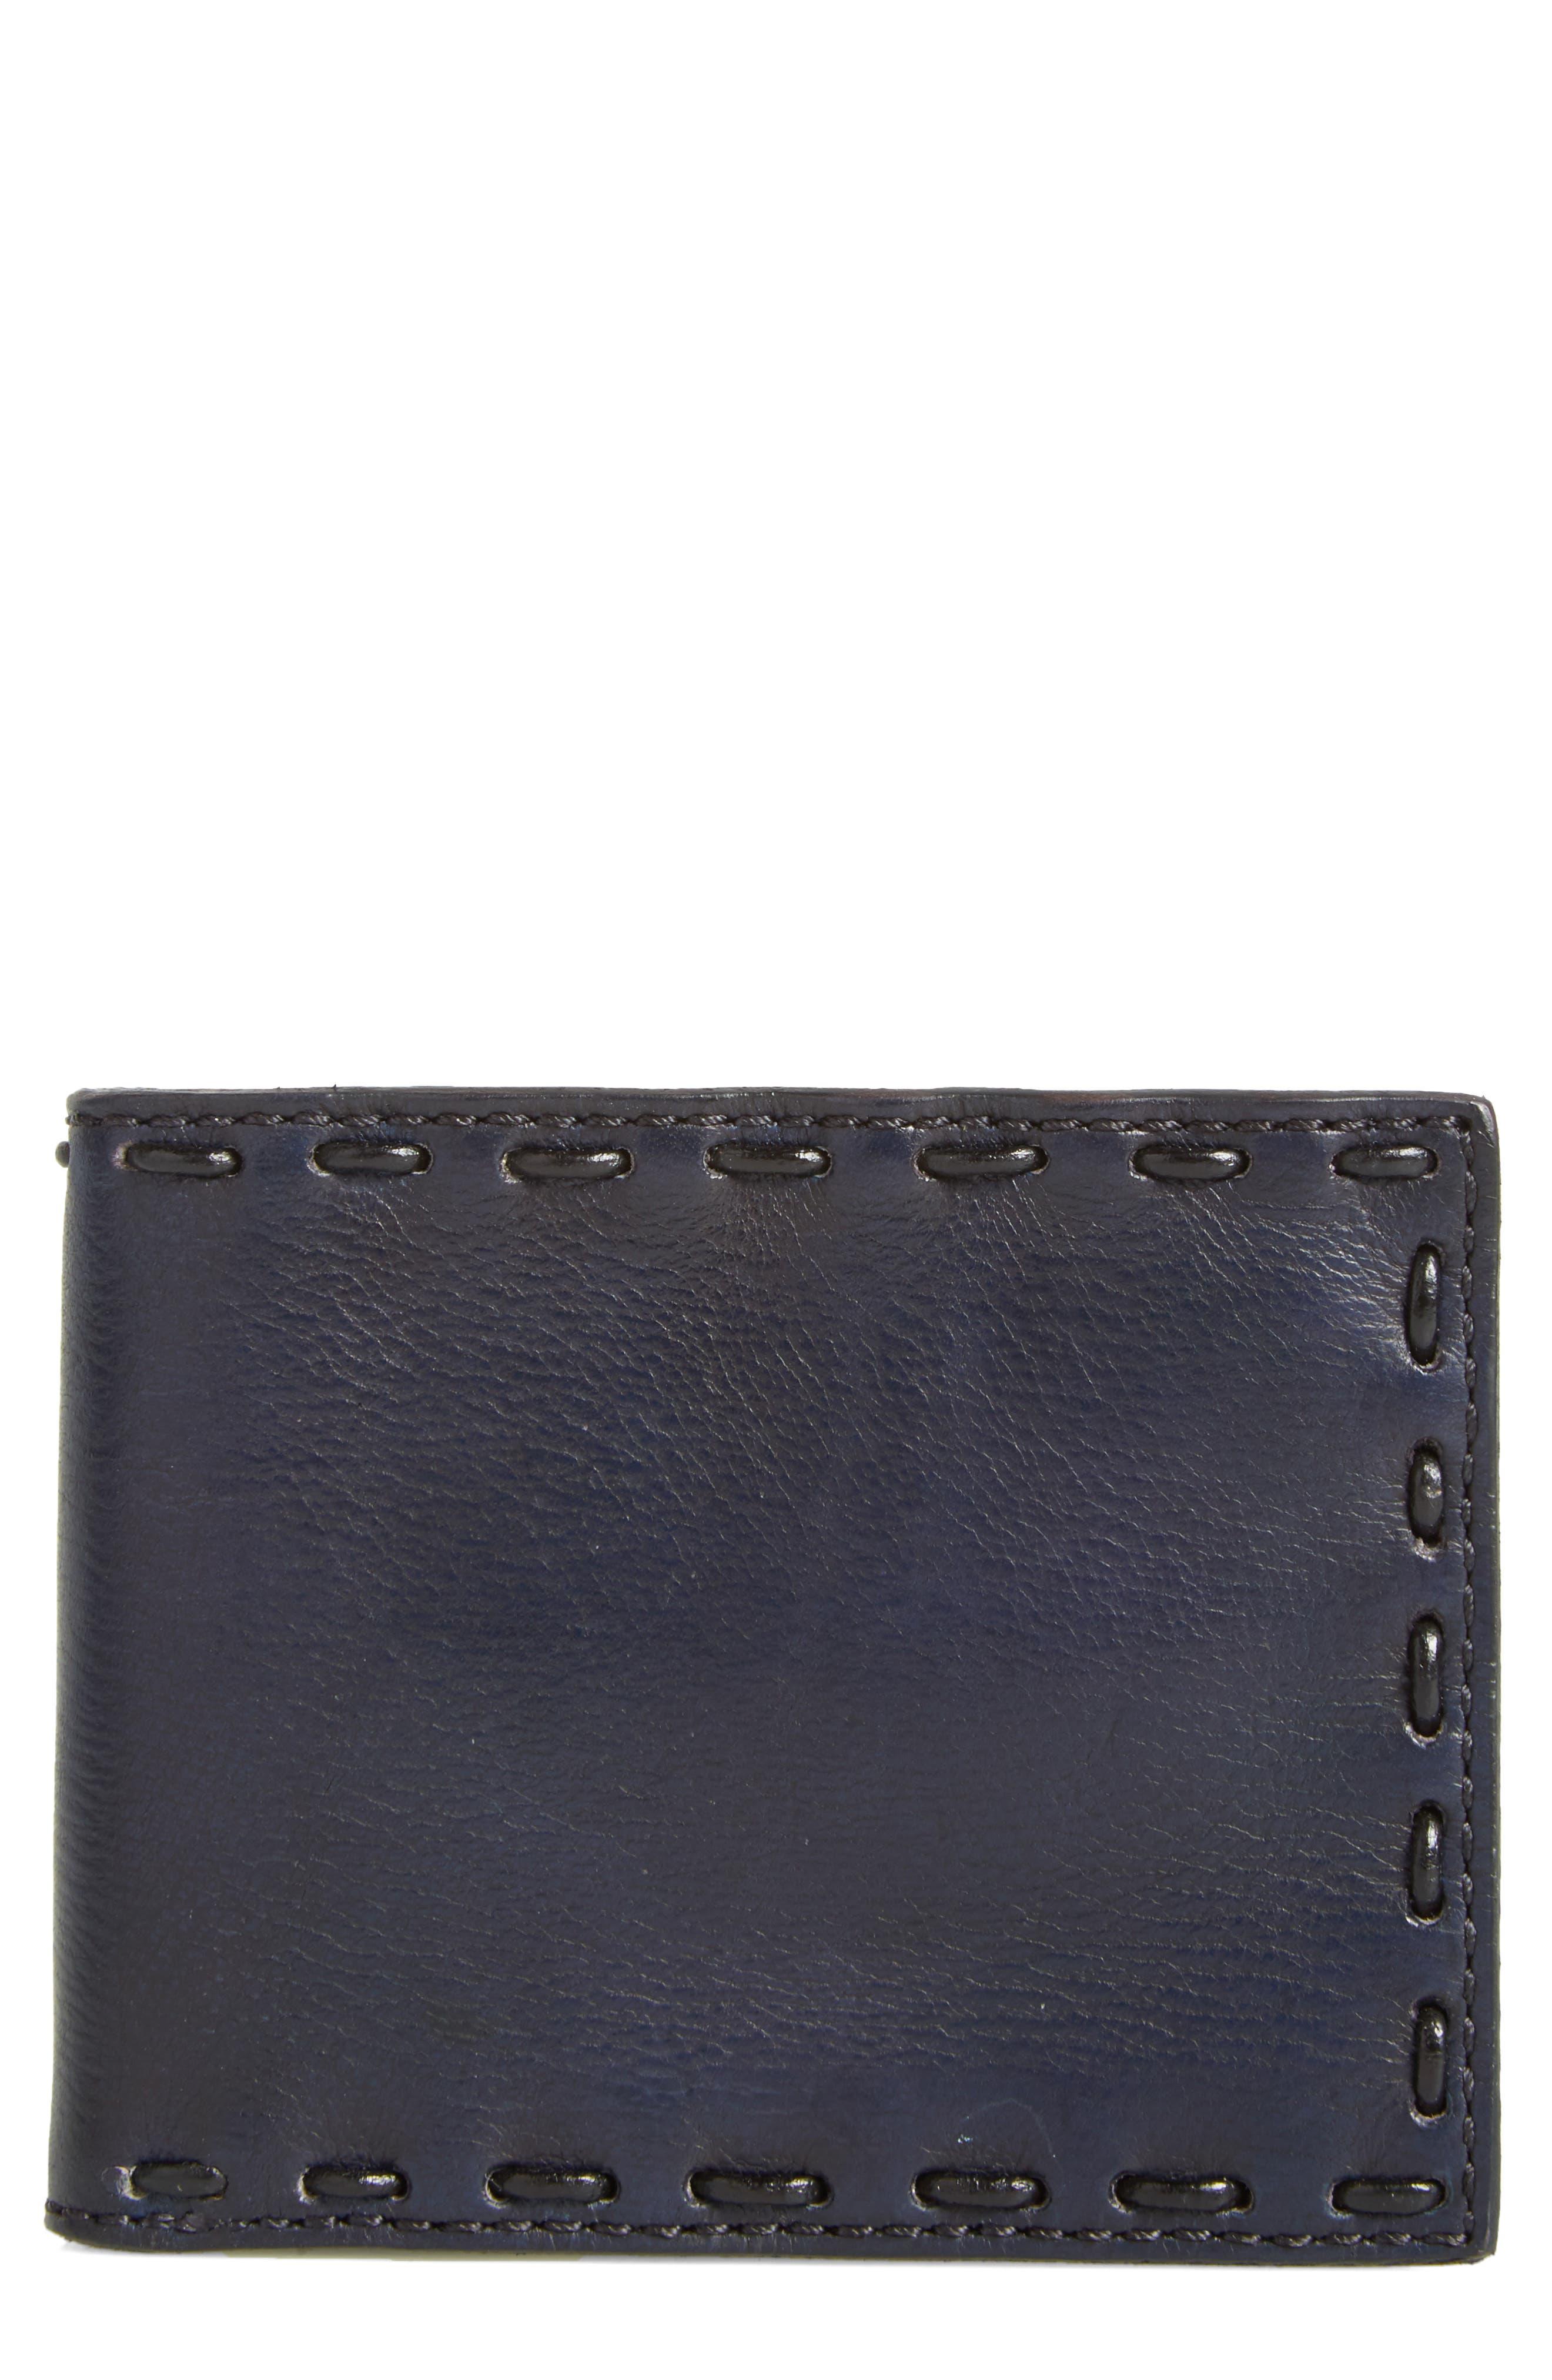 Pickstitch Leather Bifold Wallet,                         Main,                         color, 094